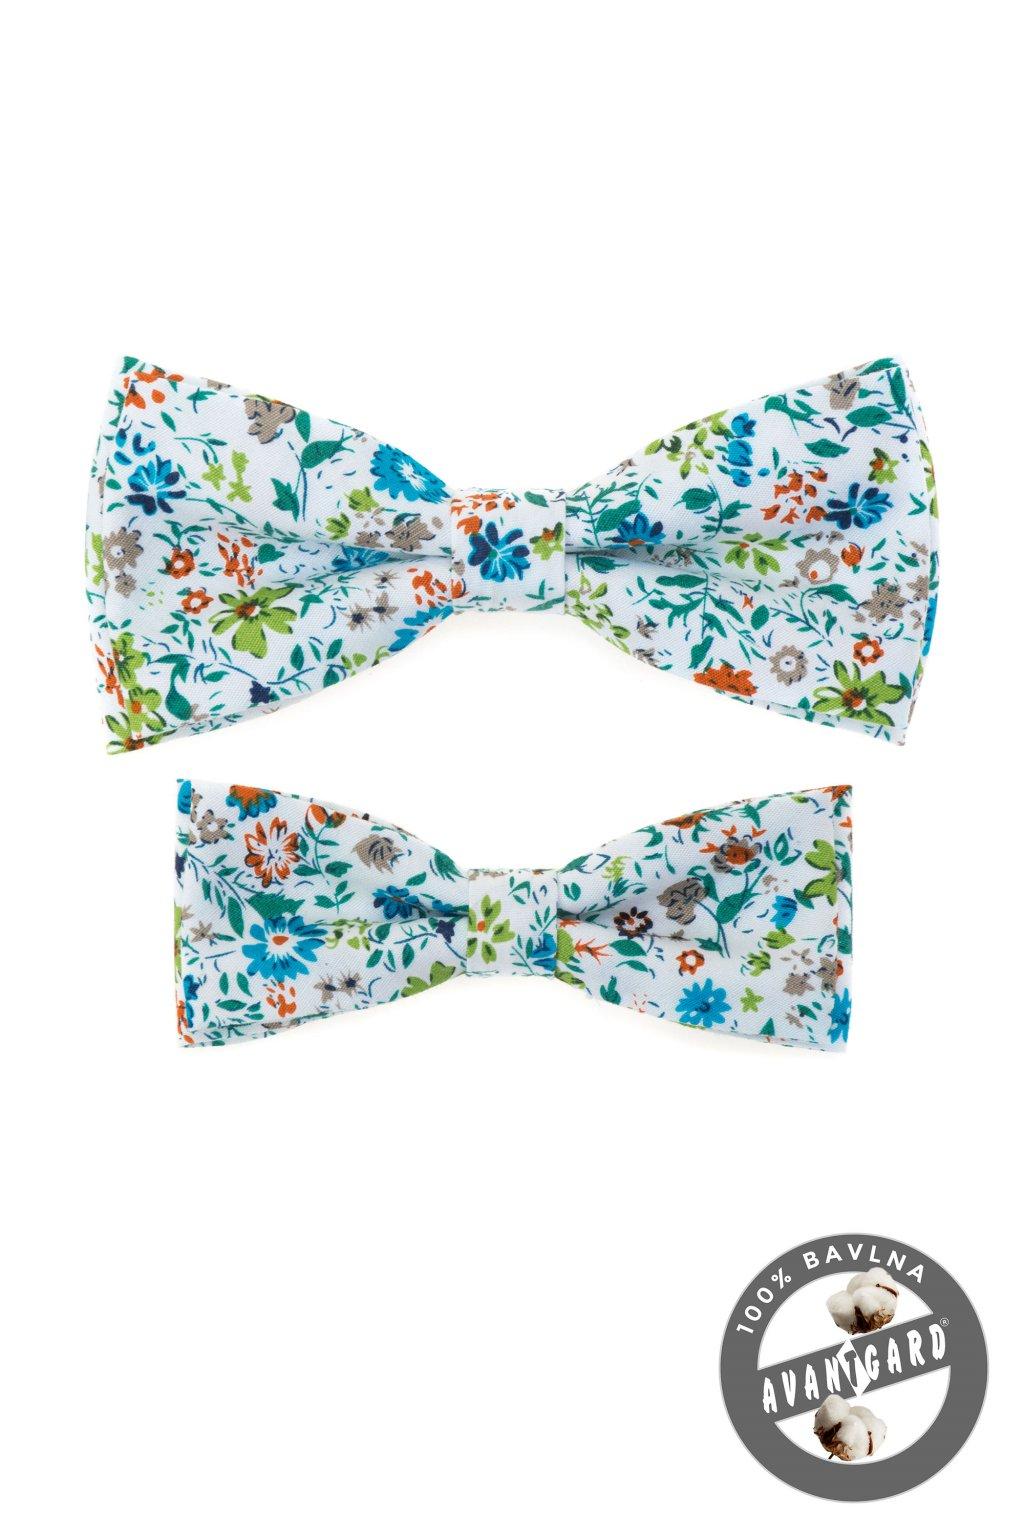 Bílá květinová sada bavlněných motýlků Otec a syn 775 - 5194